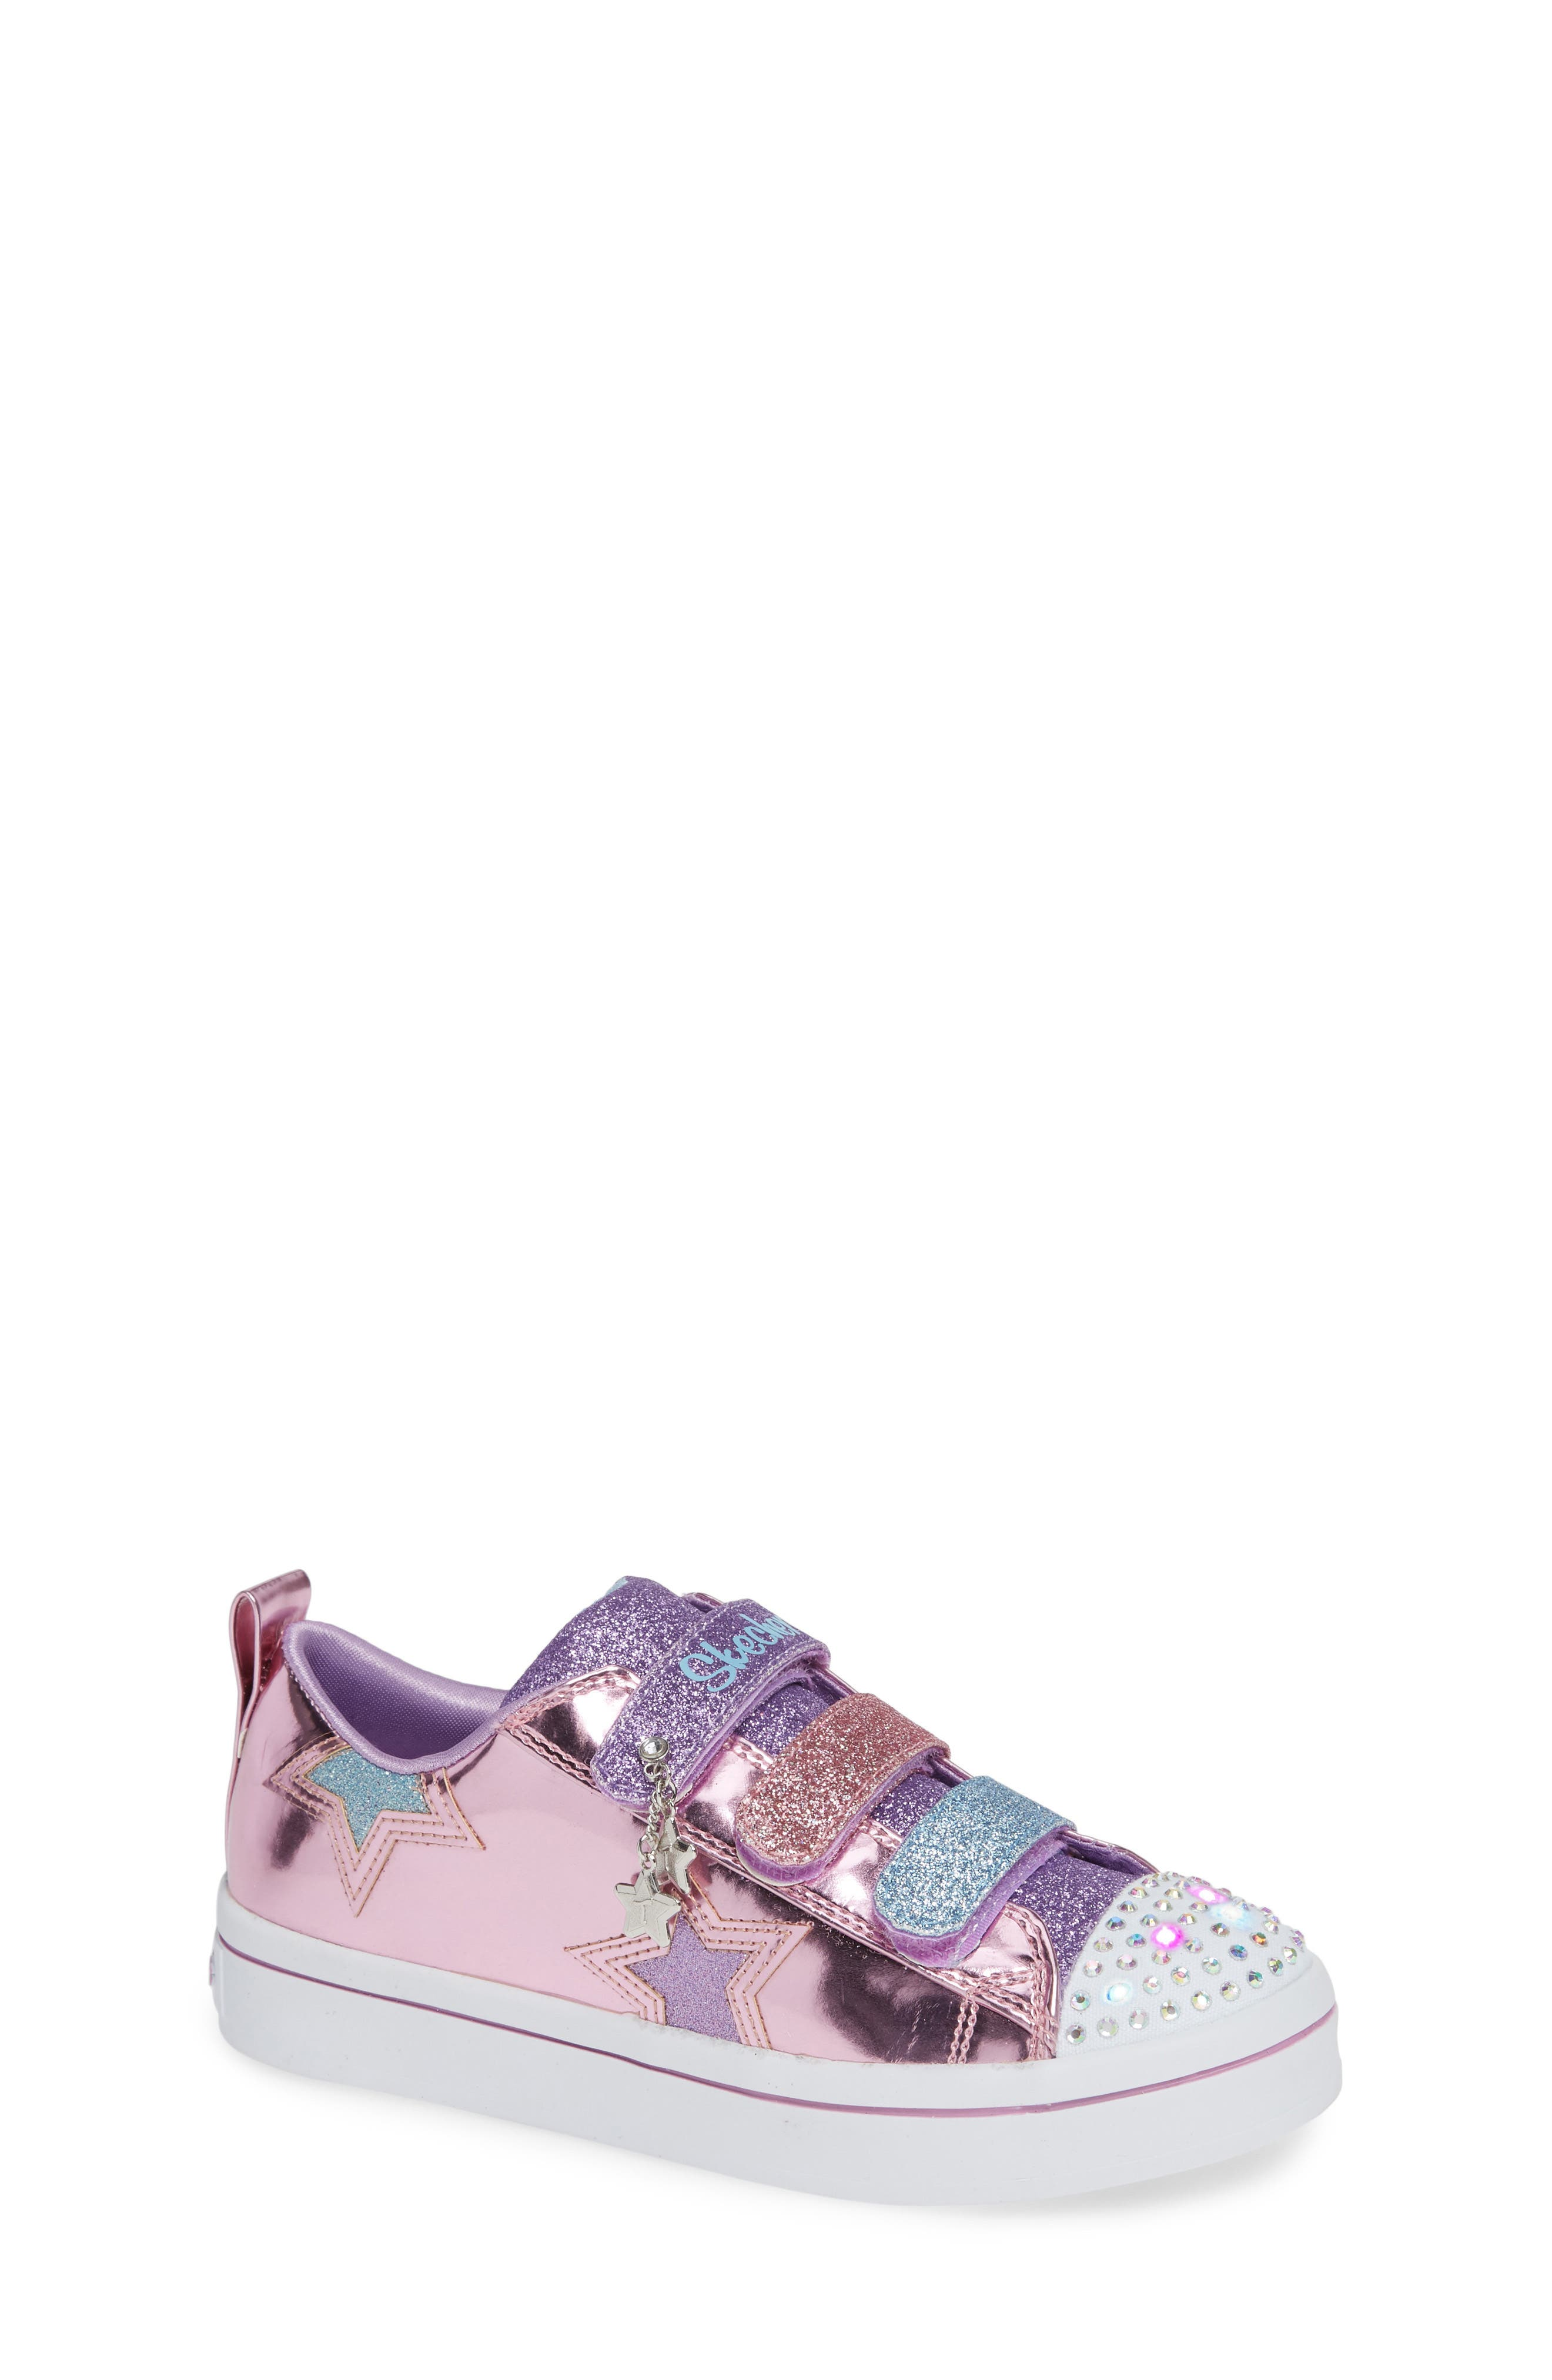 Twi-Lites Star Light-Up Sneaker,                             Alternate thumbnail 7, color,                             PINK/ MULTI